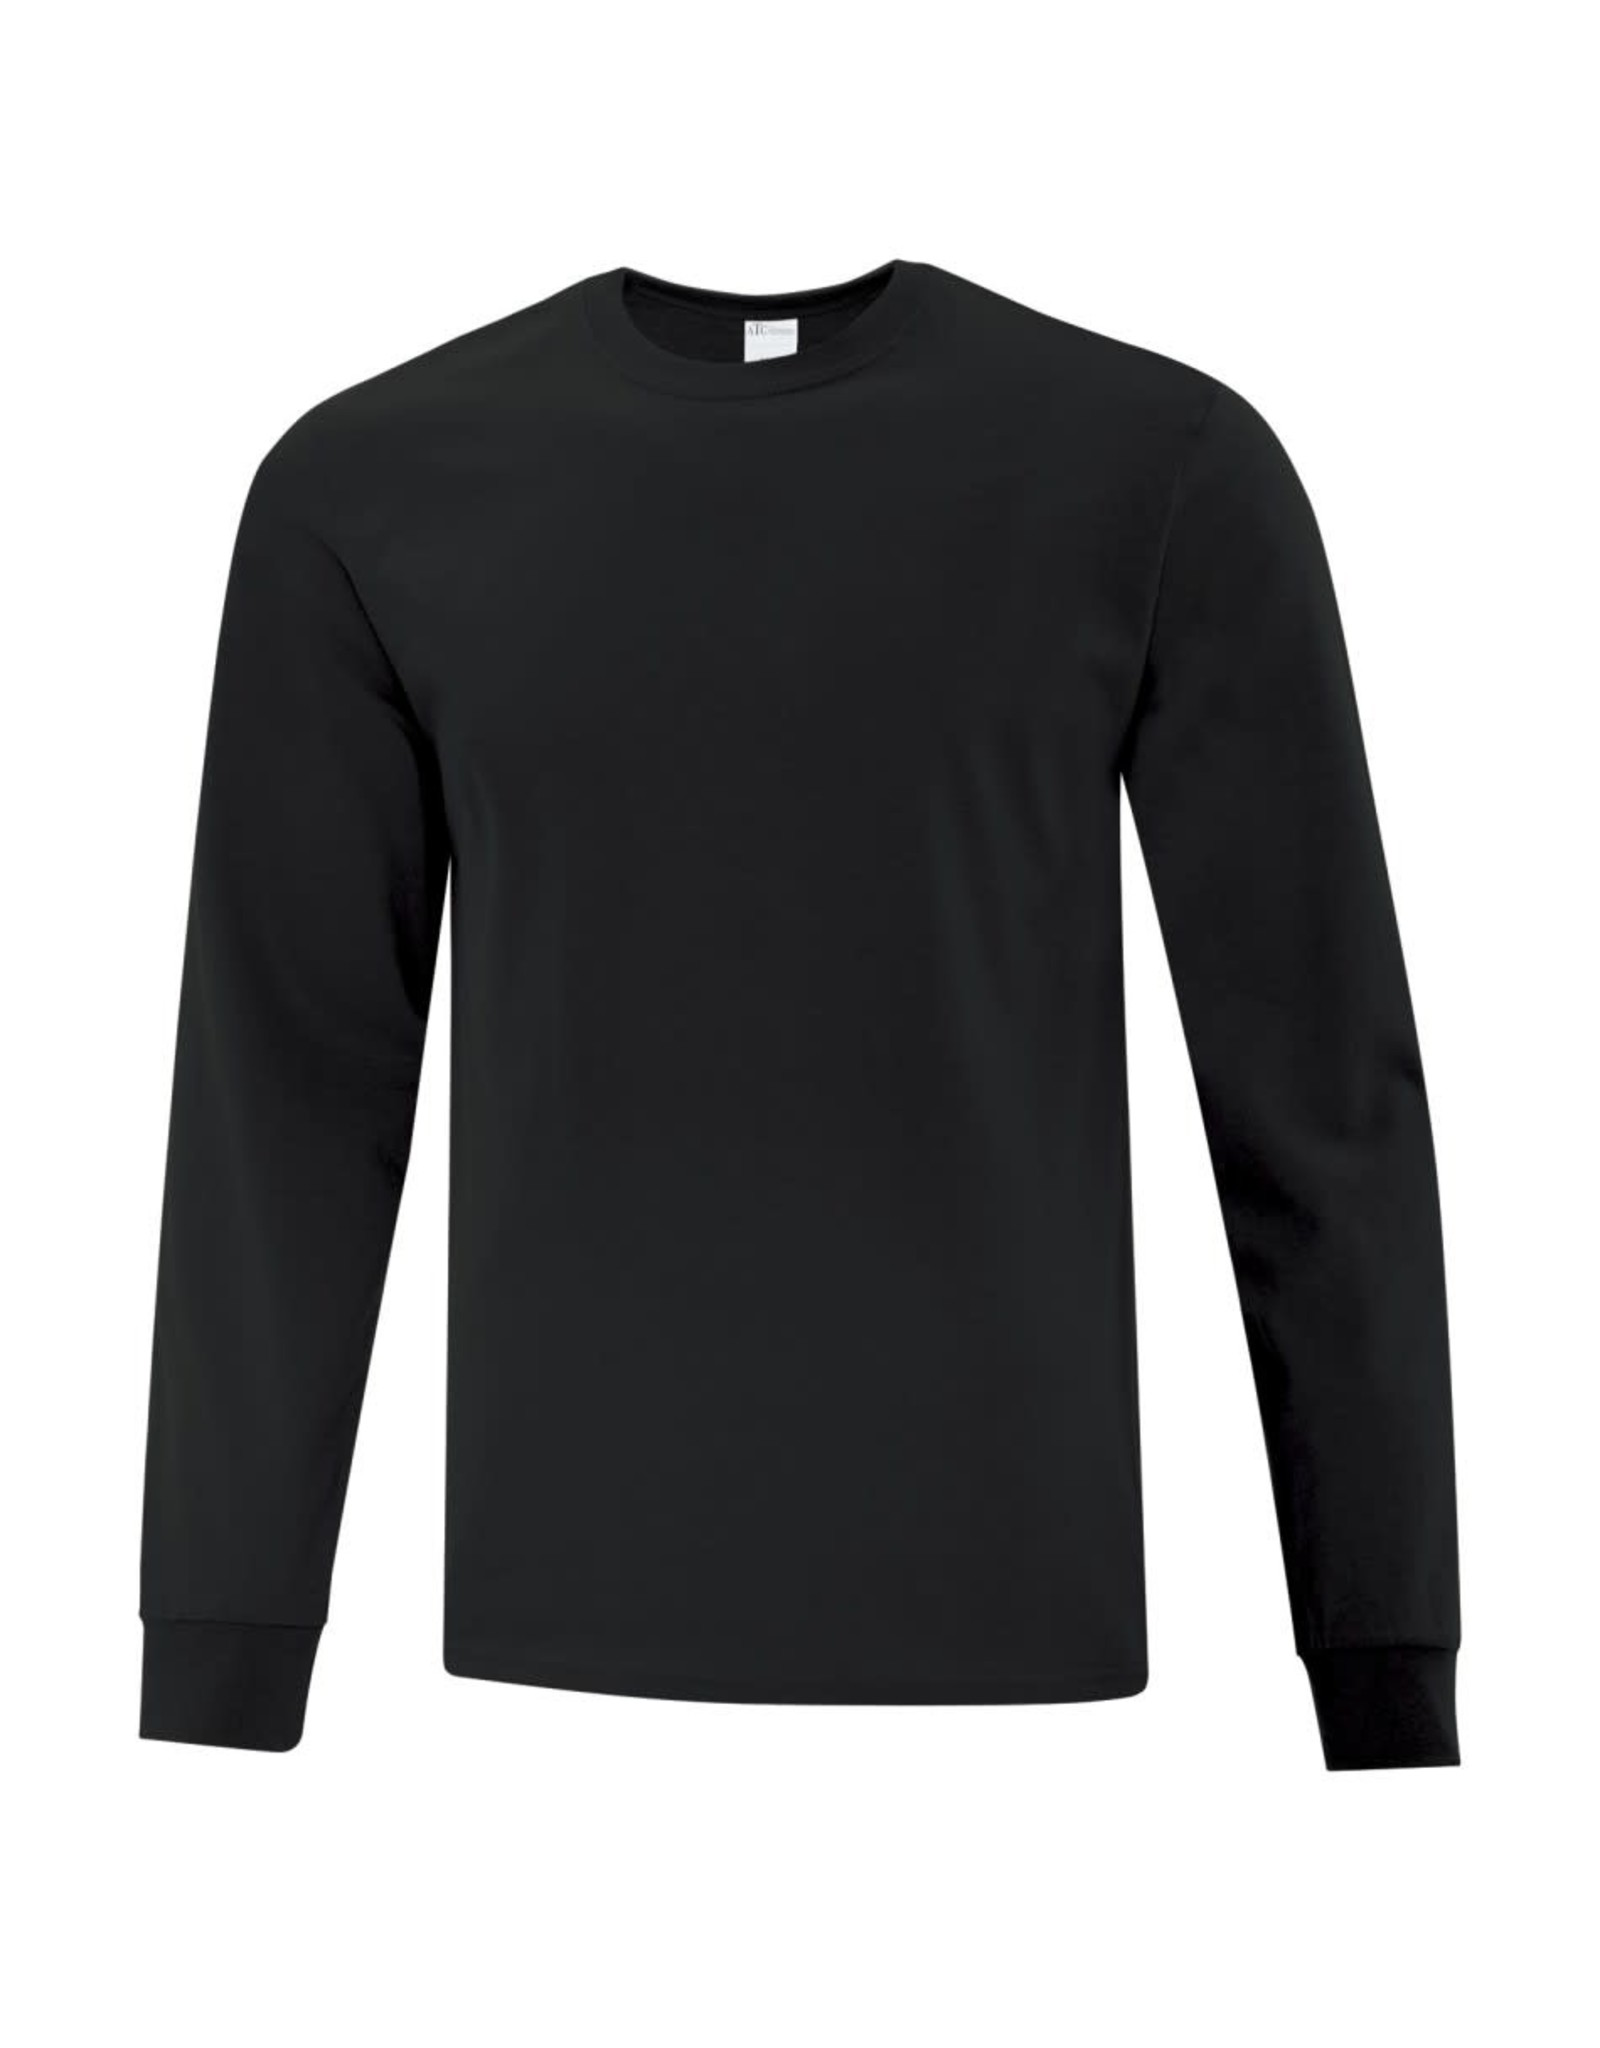 ATC Everyday Cotton Long Sleeve